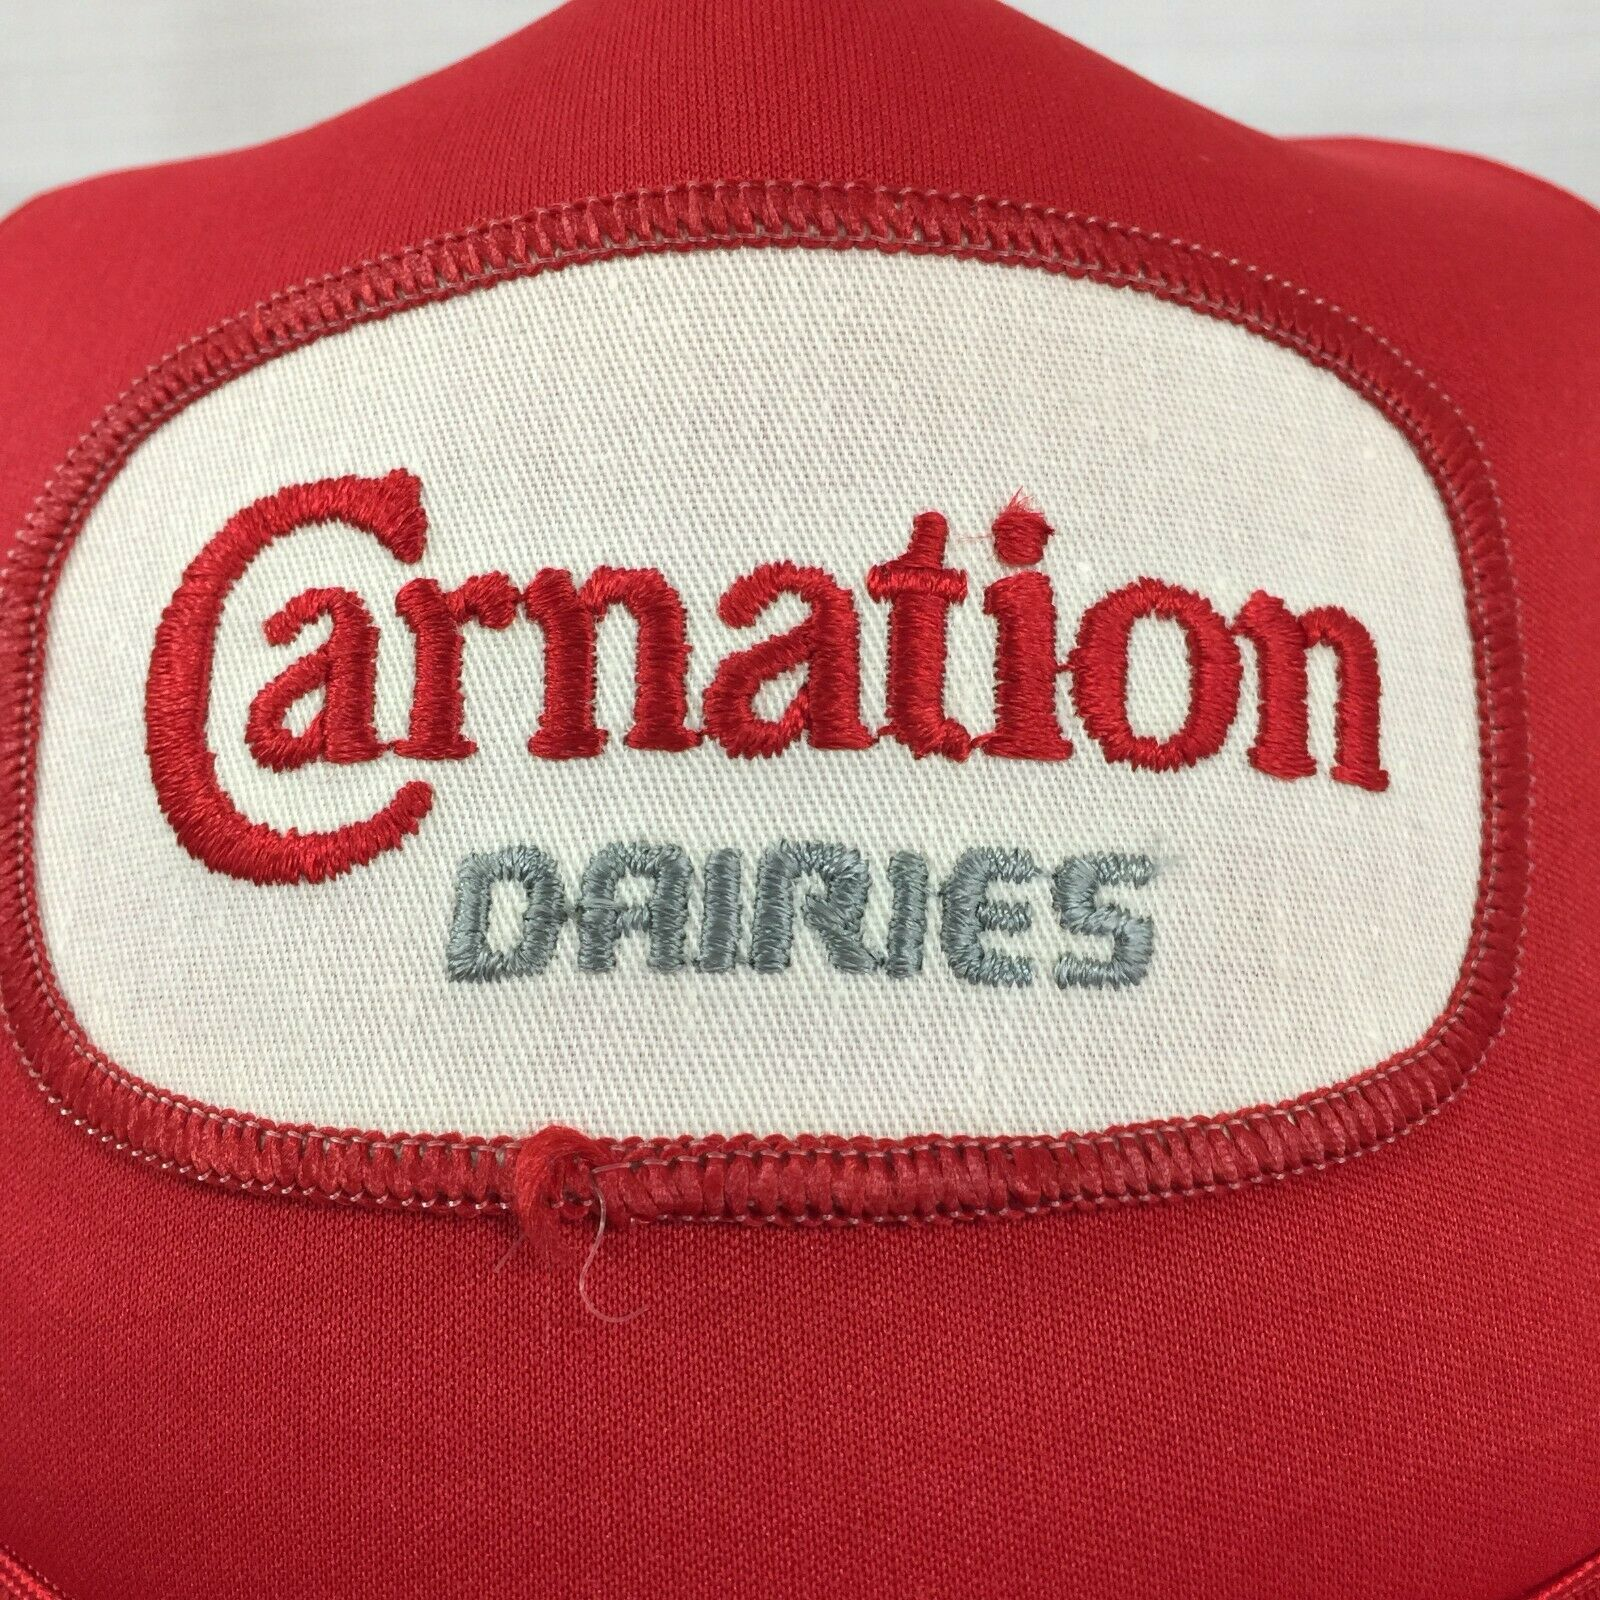 Red Carnation Dairies Snapback Trucker Hat Cap Lo… - image 3